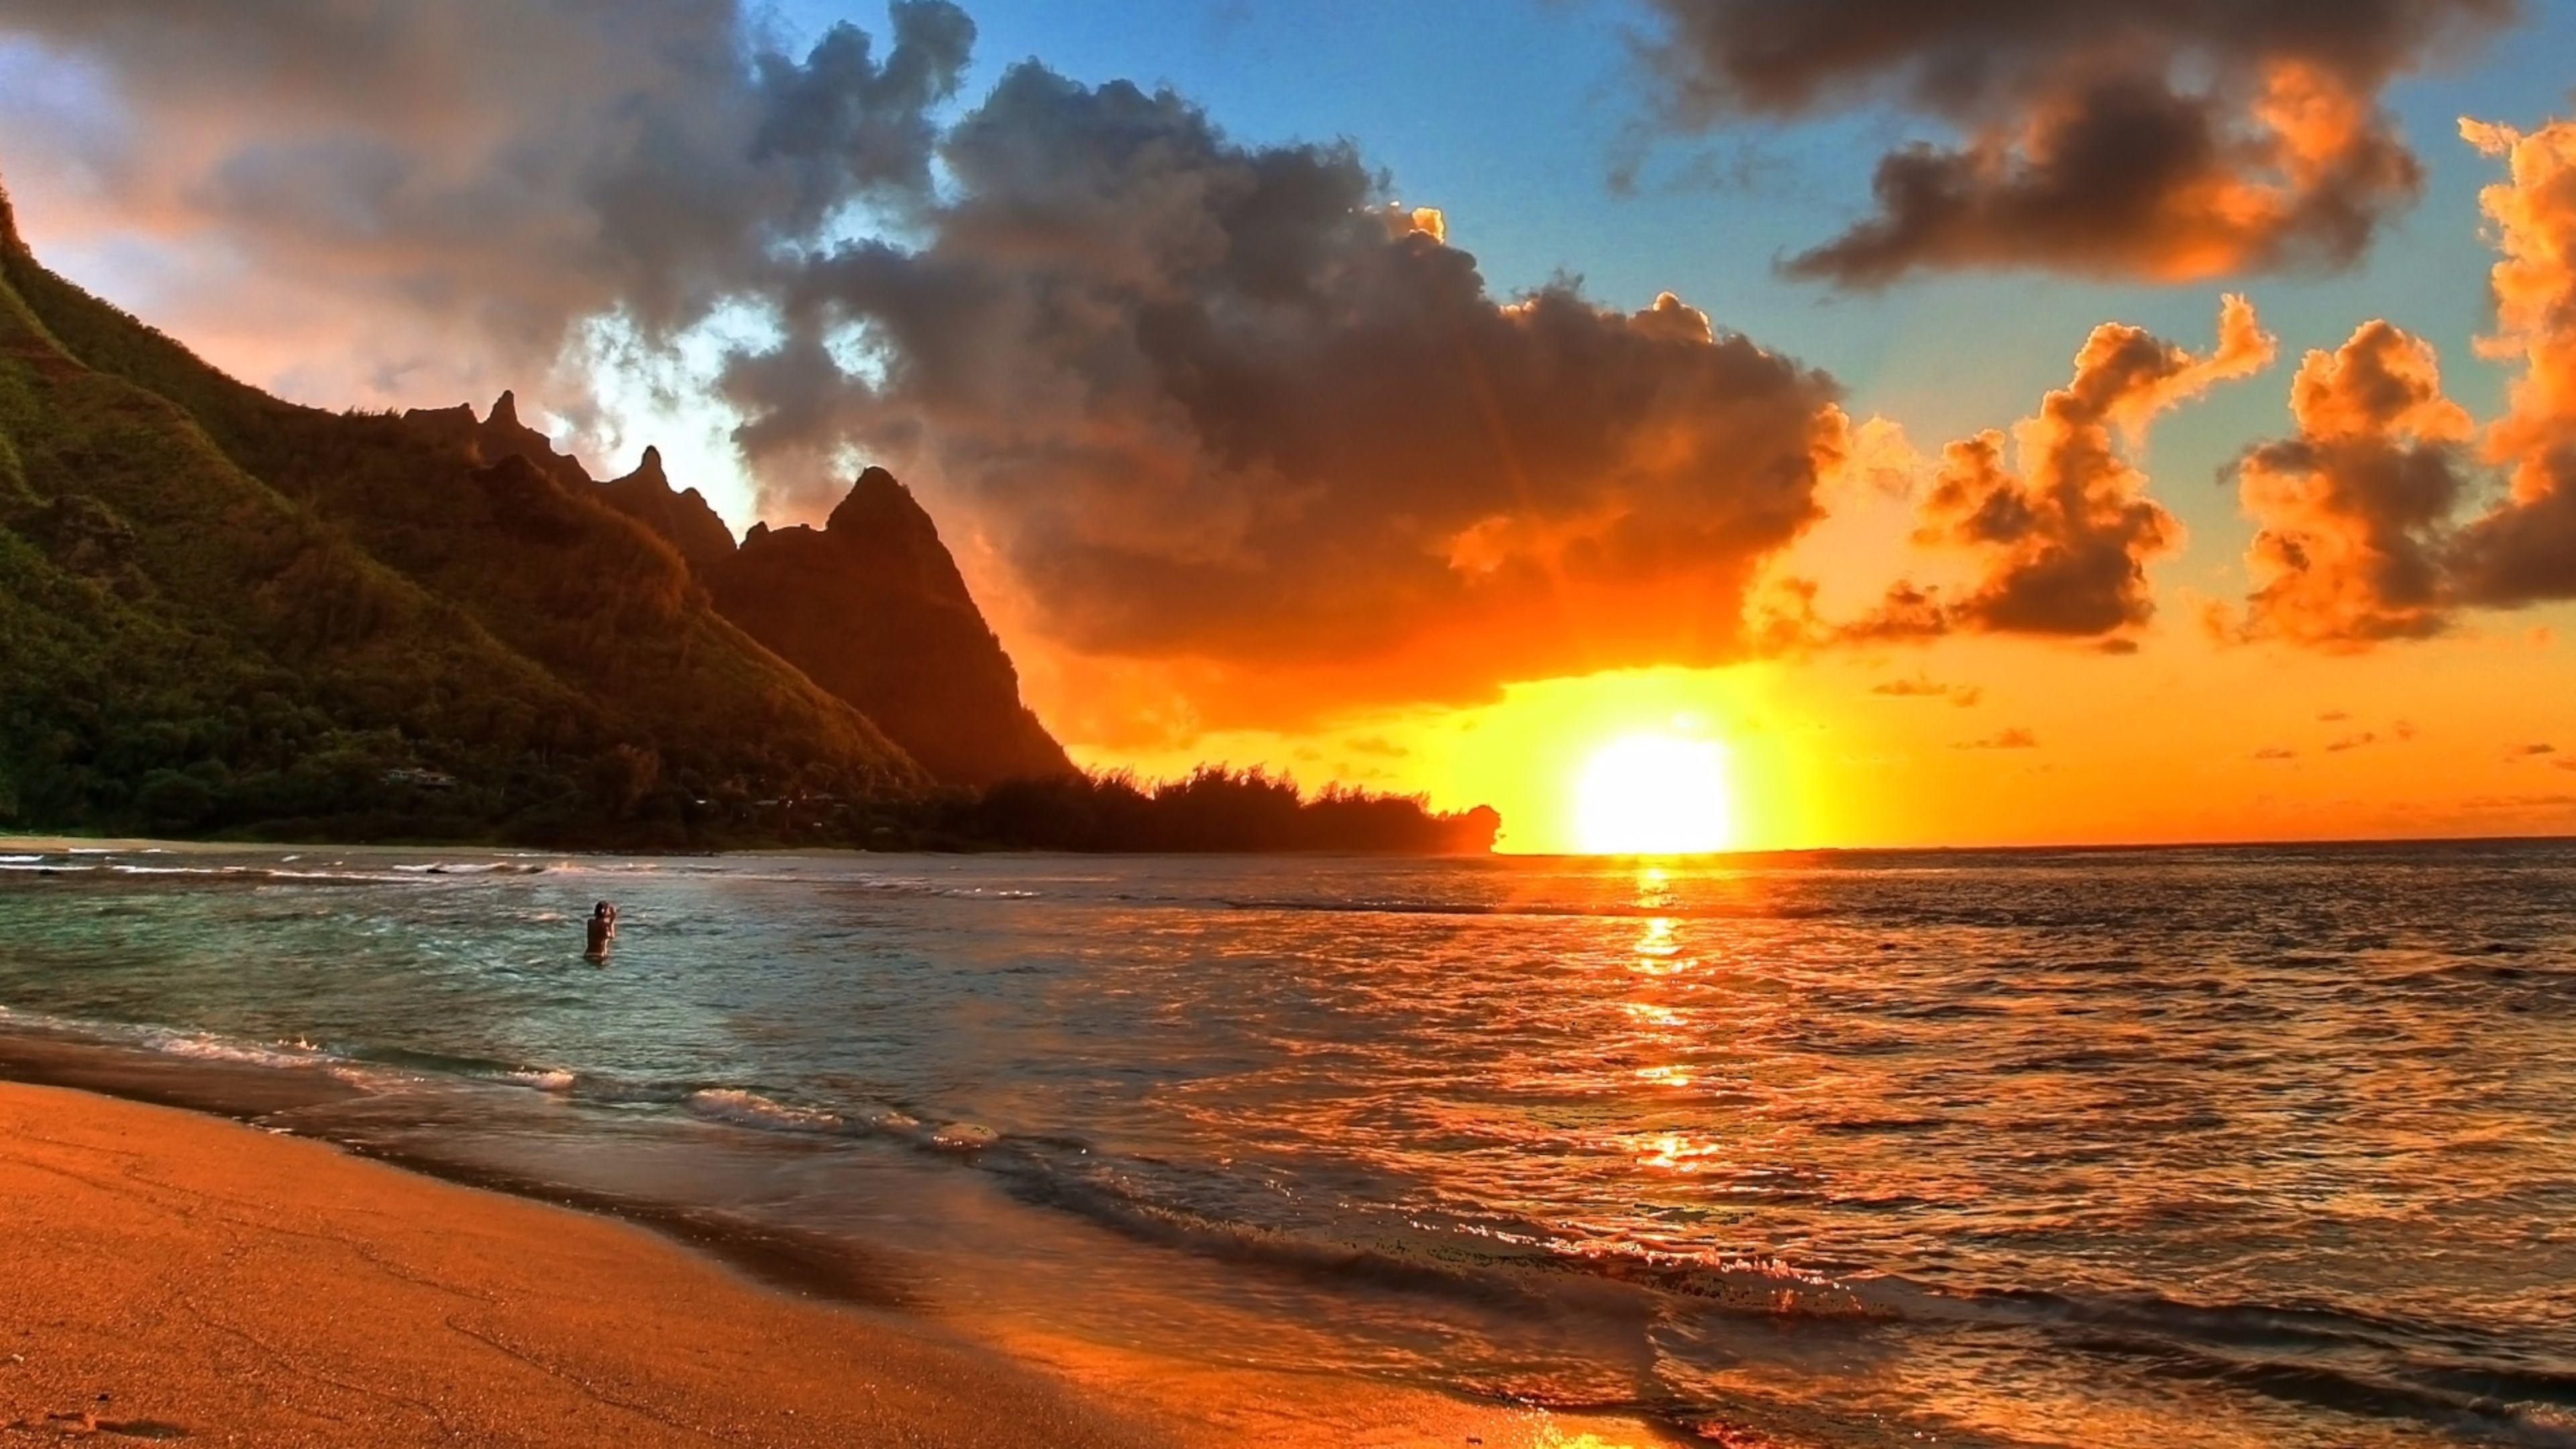 Res: 3840x2160, Romantic Beach Sunset Wallpaper Desktop Background On Wallpaper Hd 3840 x  2160 px 2.43 MB ocean